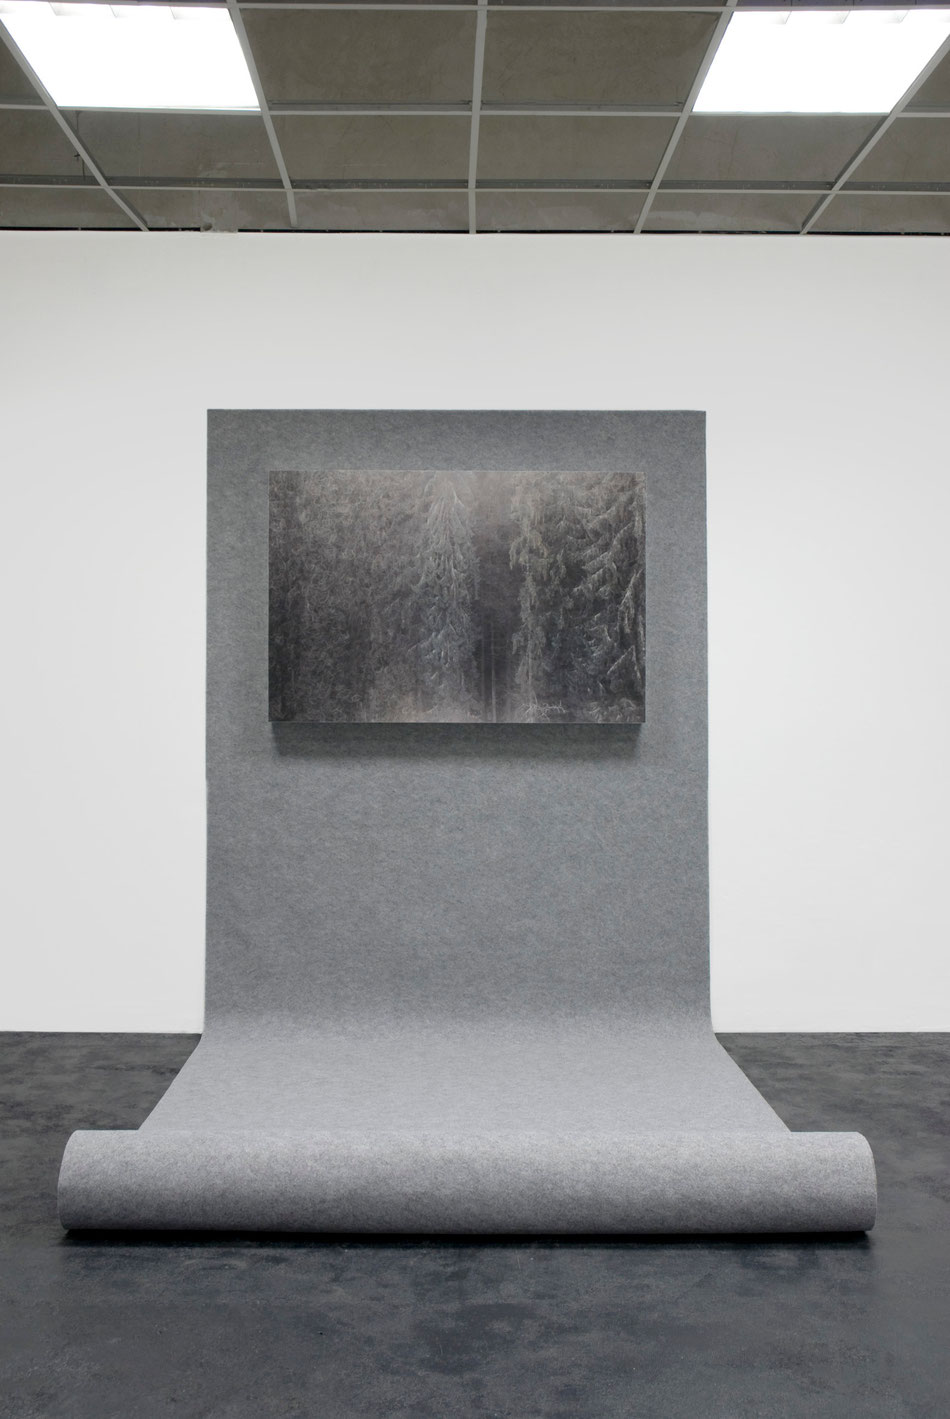 mateusz sadowski, leak, exile, berlin